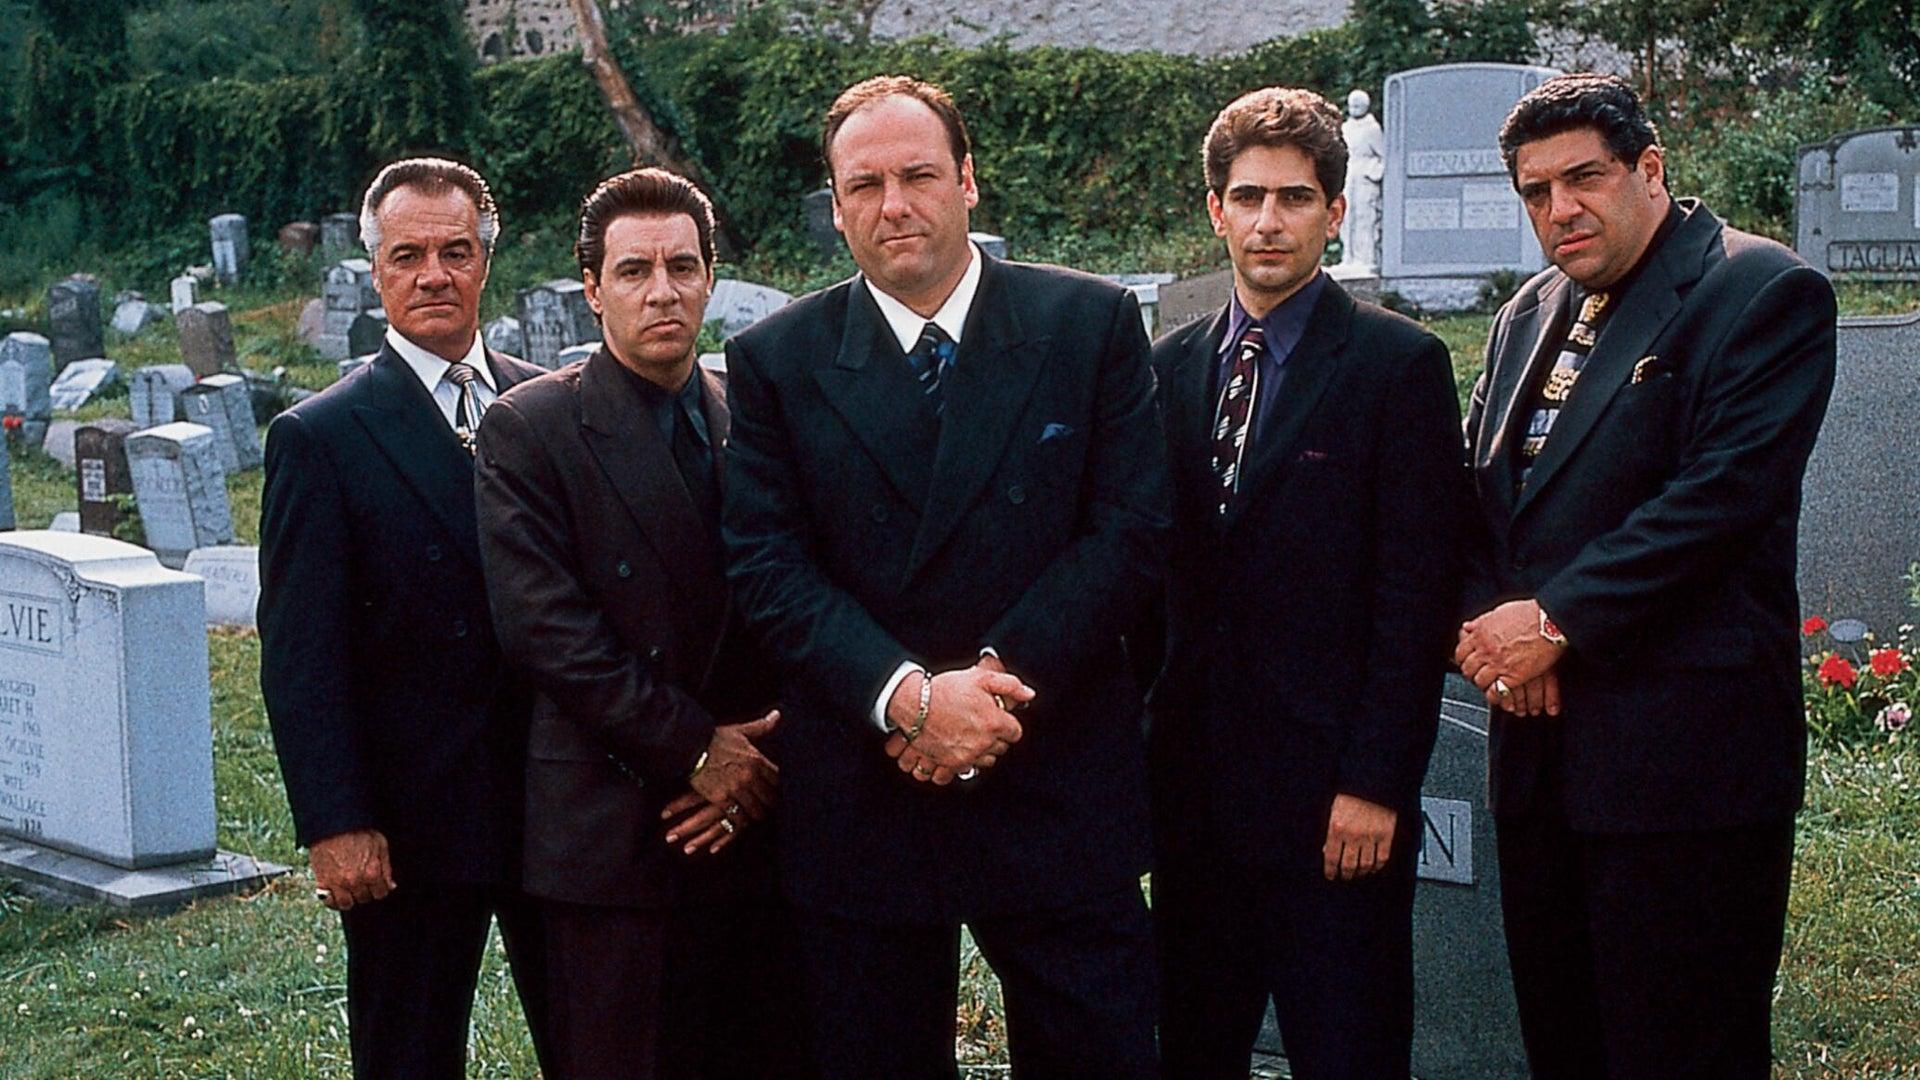 Tony Sirico, Steven Van Zandt, James Gandolfini, Michael Imperioli, and  Vincent Pastore in The Sopranos